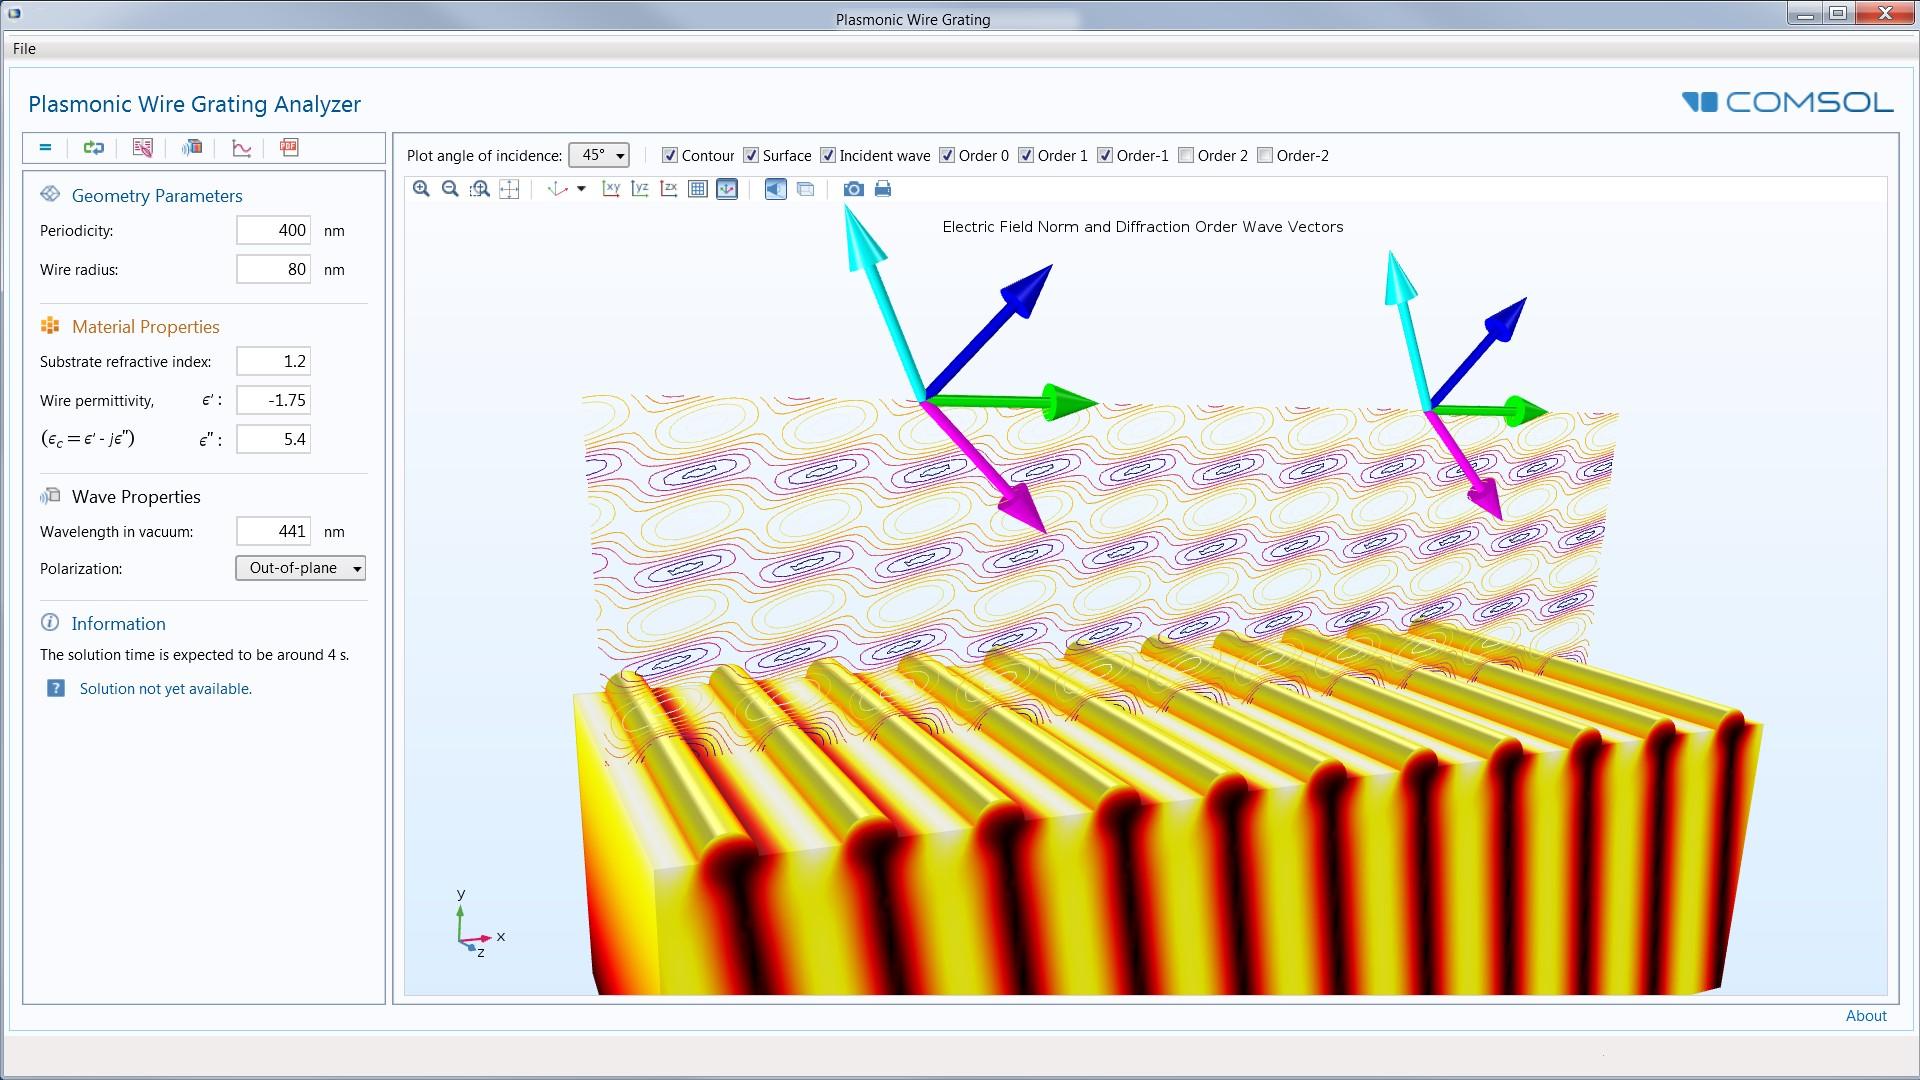 Calendar 2019 Excel Ireland Más Recientes Modeling software for Rf Microwave and Millimeter Wave Designs